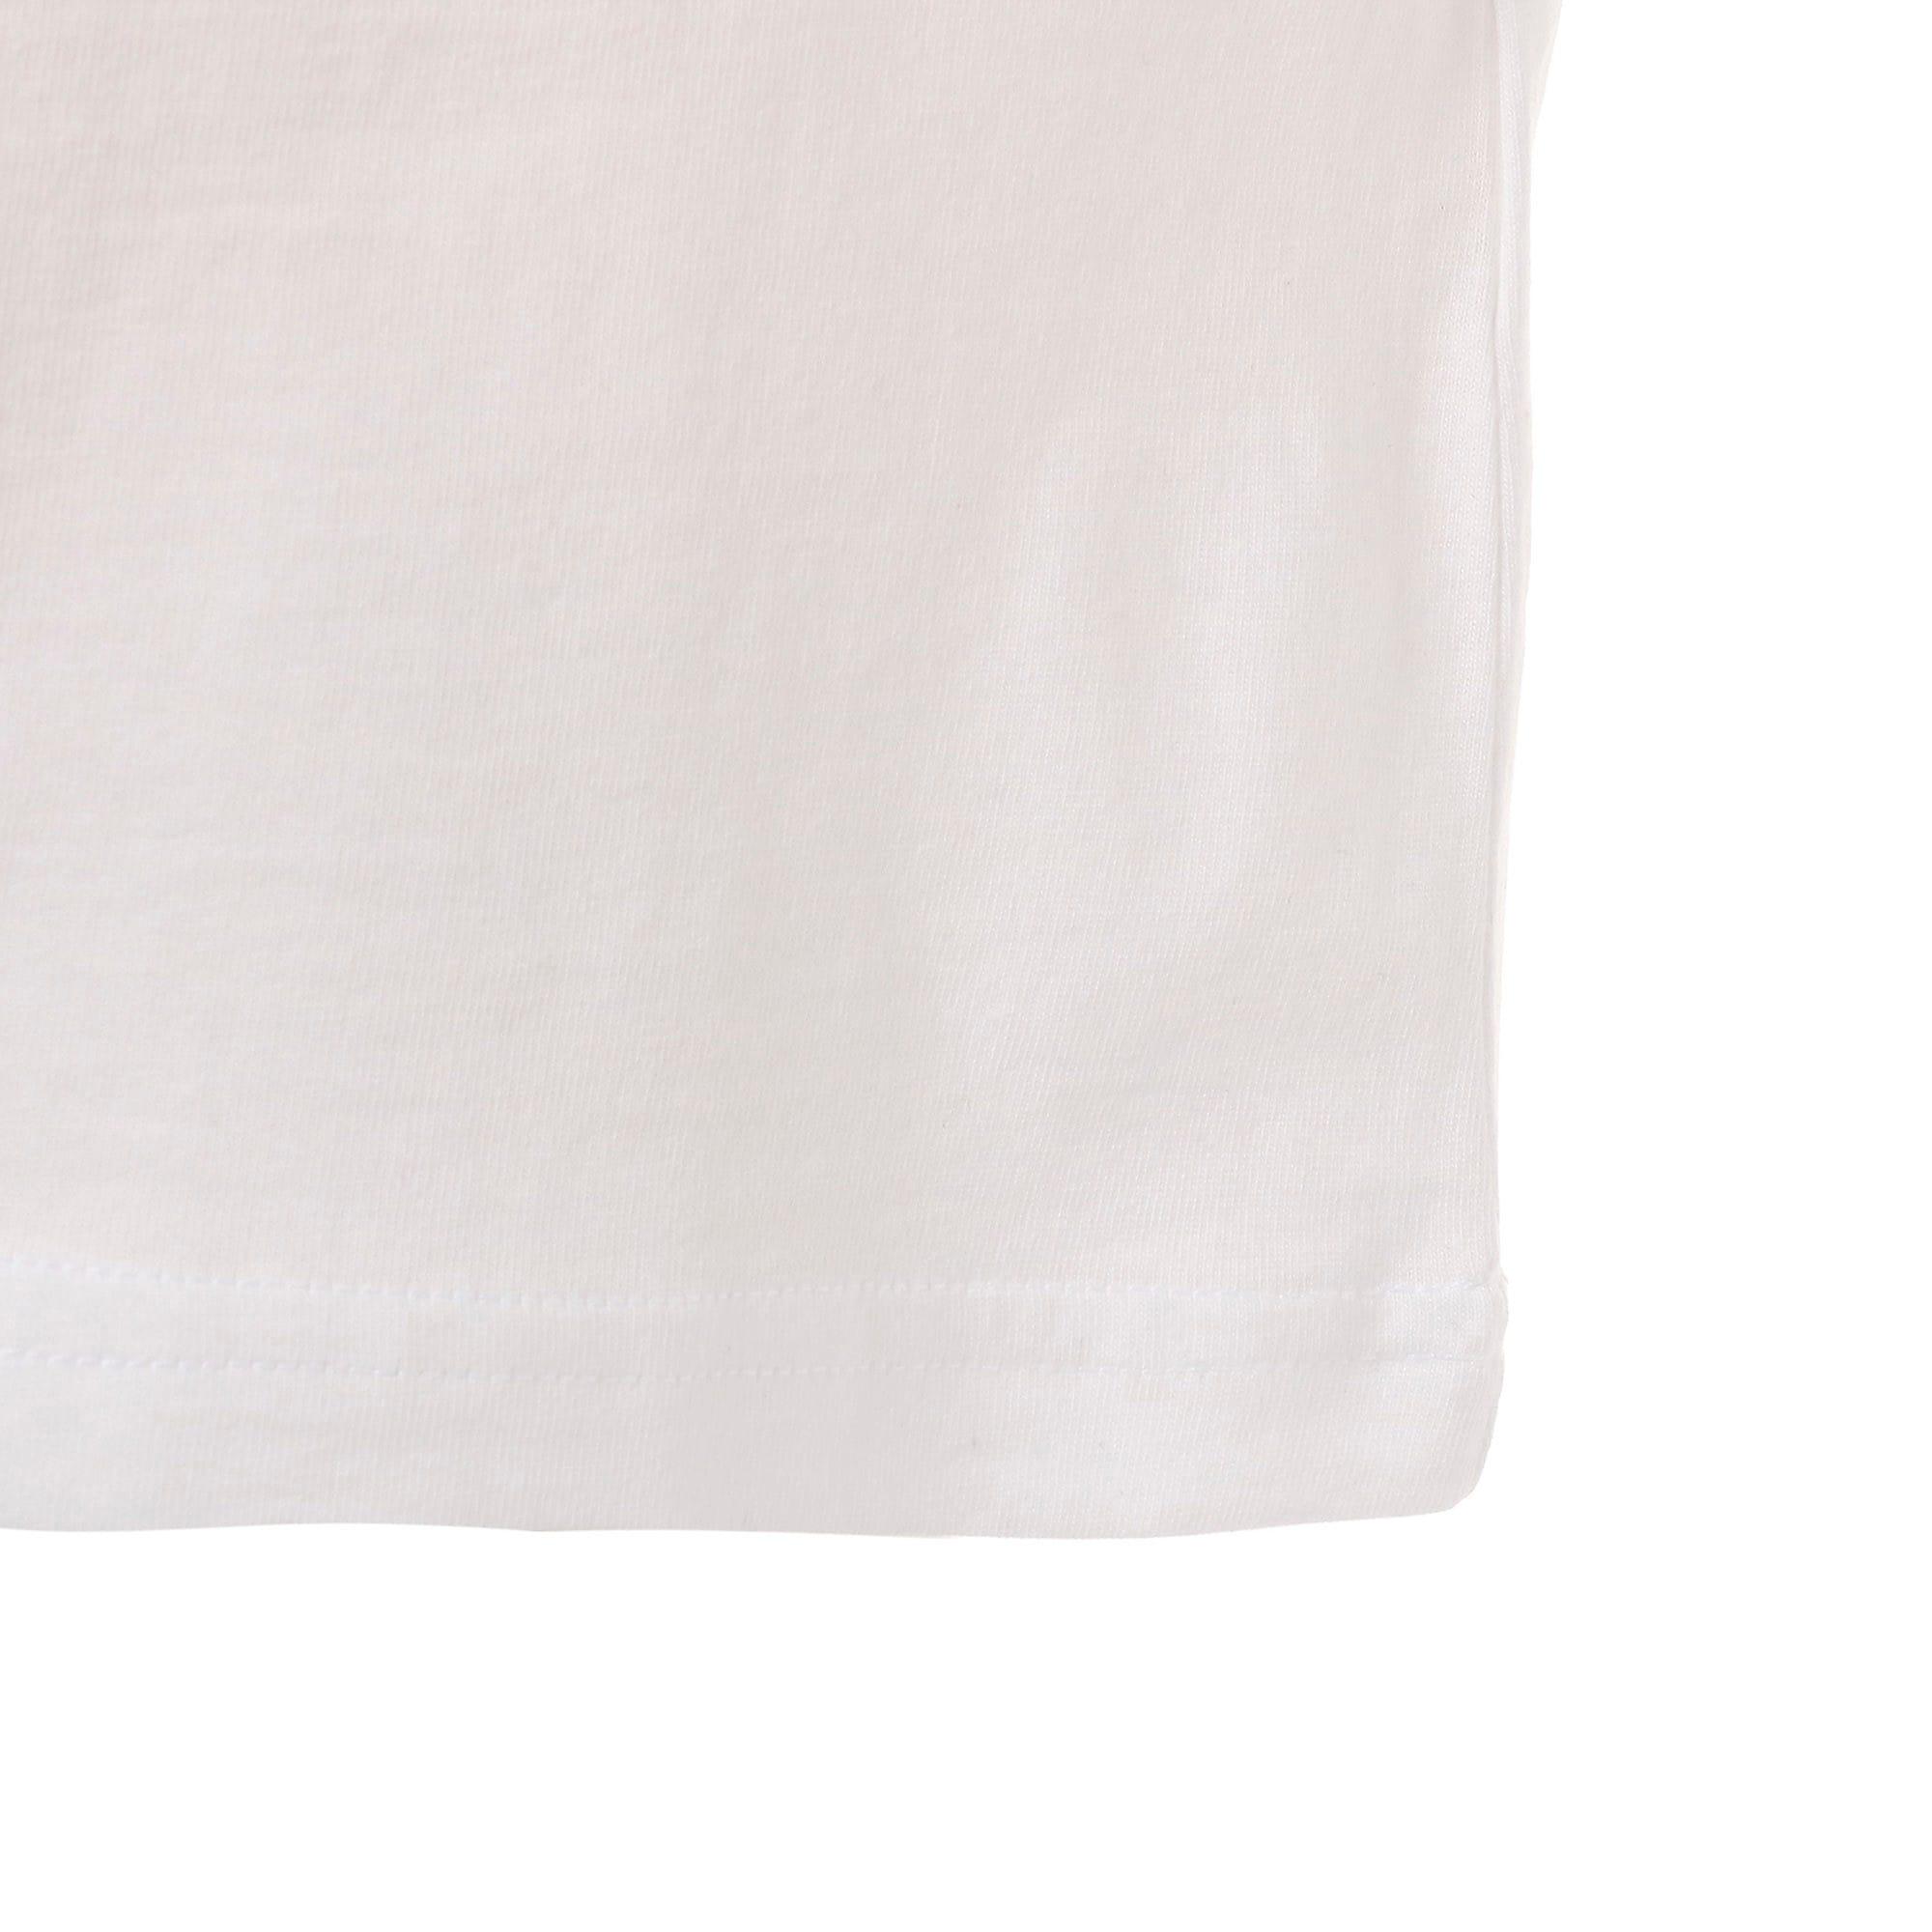 Thumbnail 8 of PUMA XTG グラフィック ウィメンズ SS Tシャツ 半袖, Puma White, medium-JPN